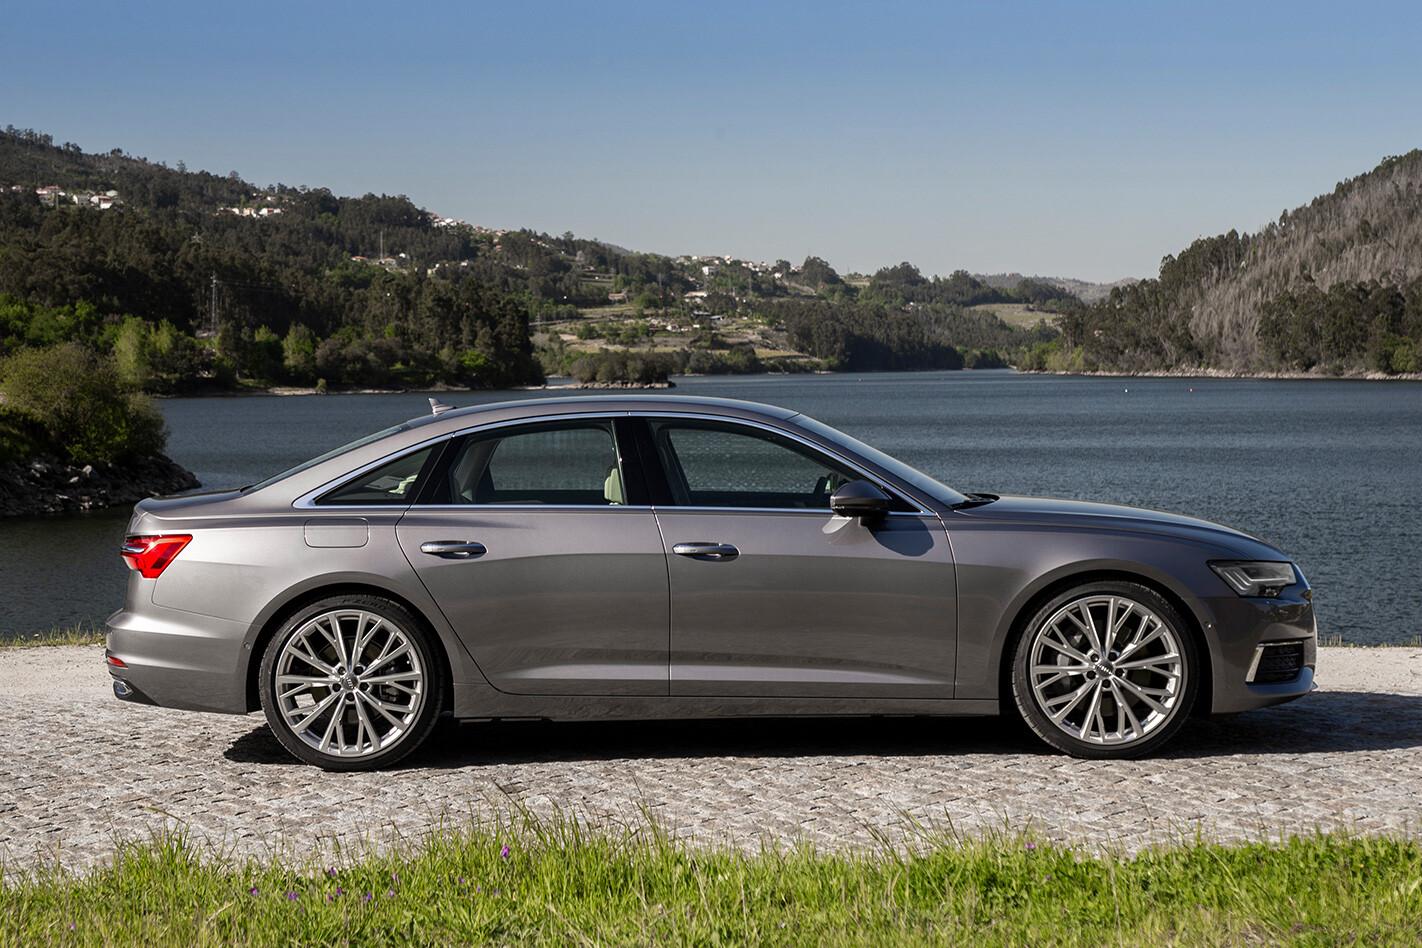 Audi A 6 Side Profile Jpg